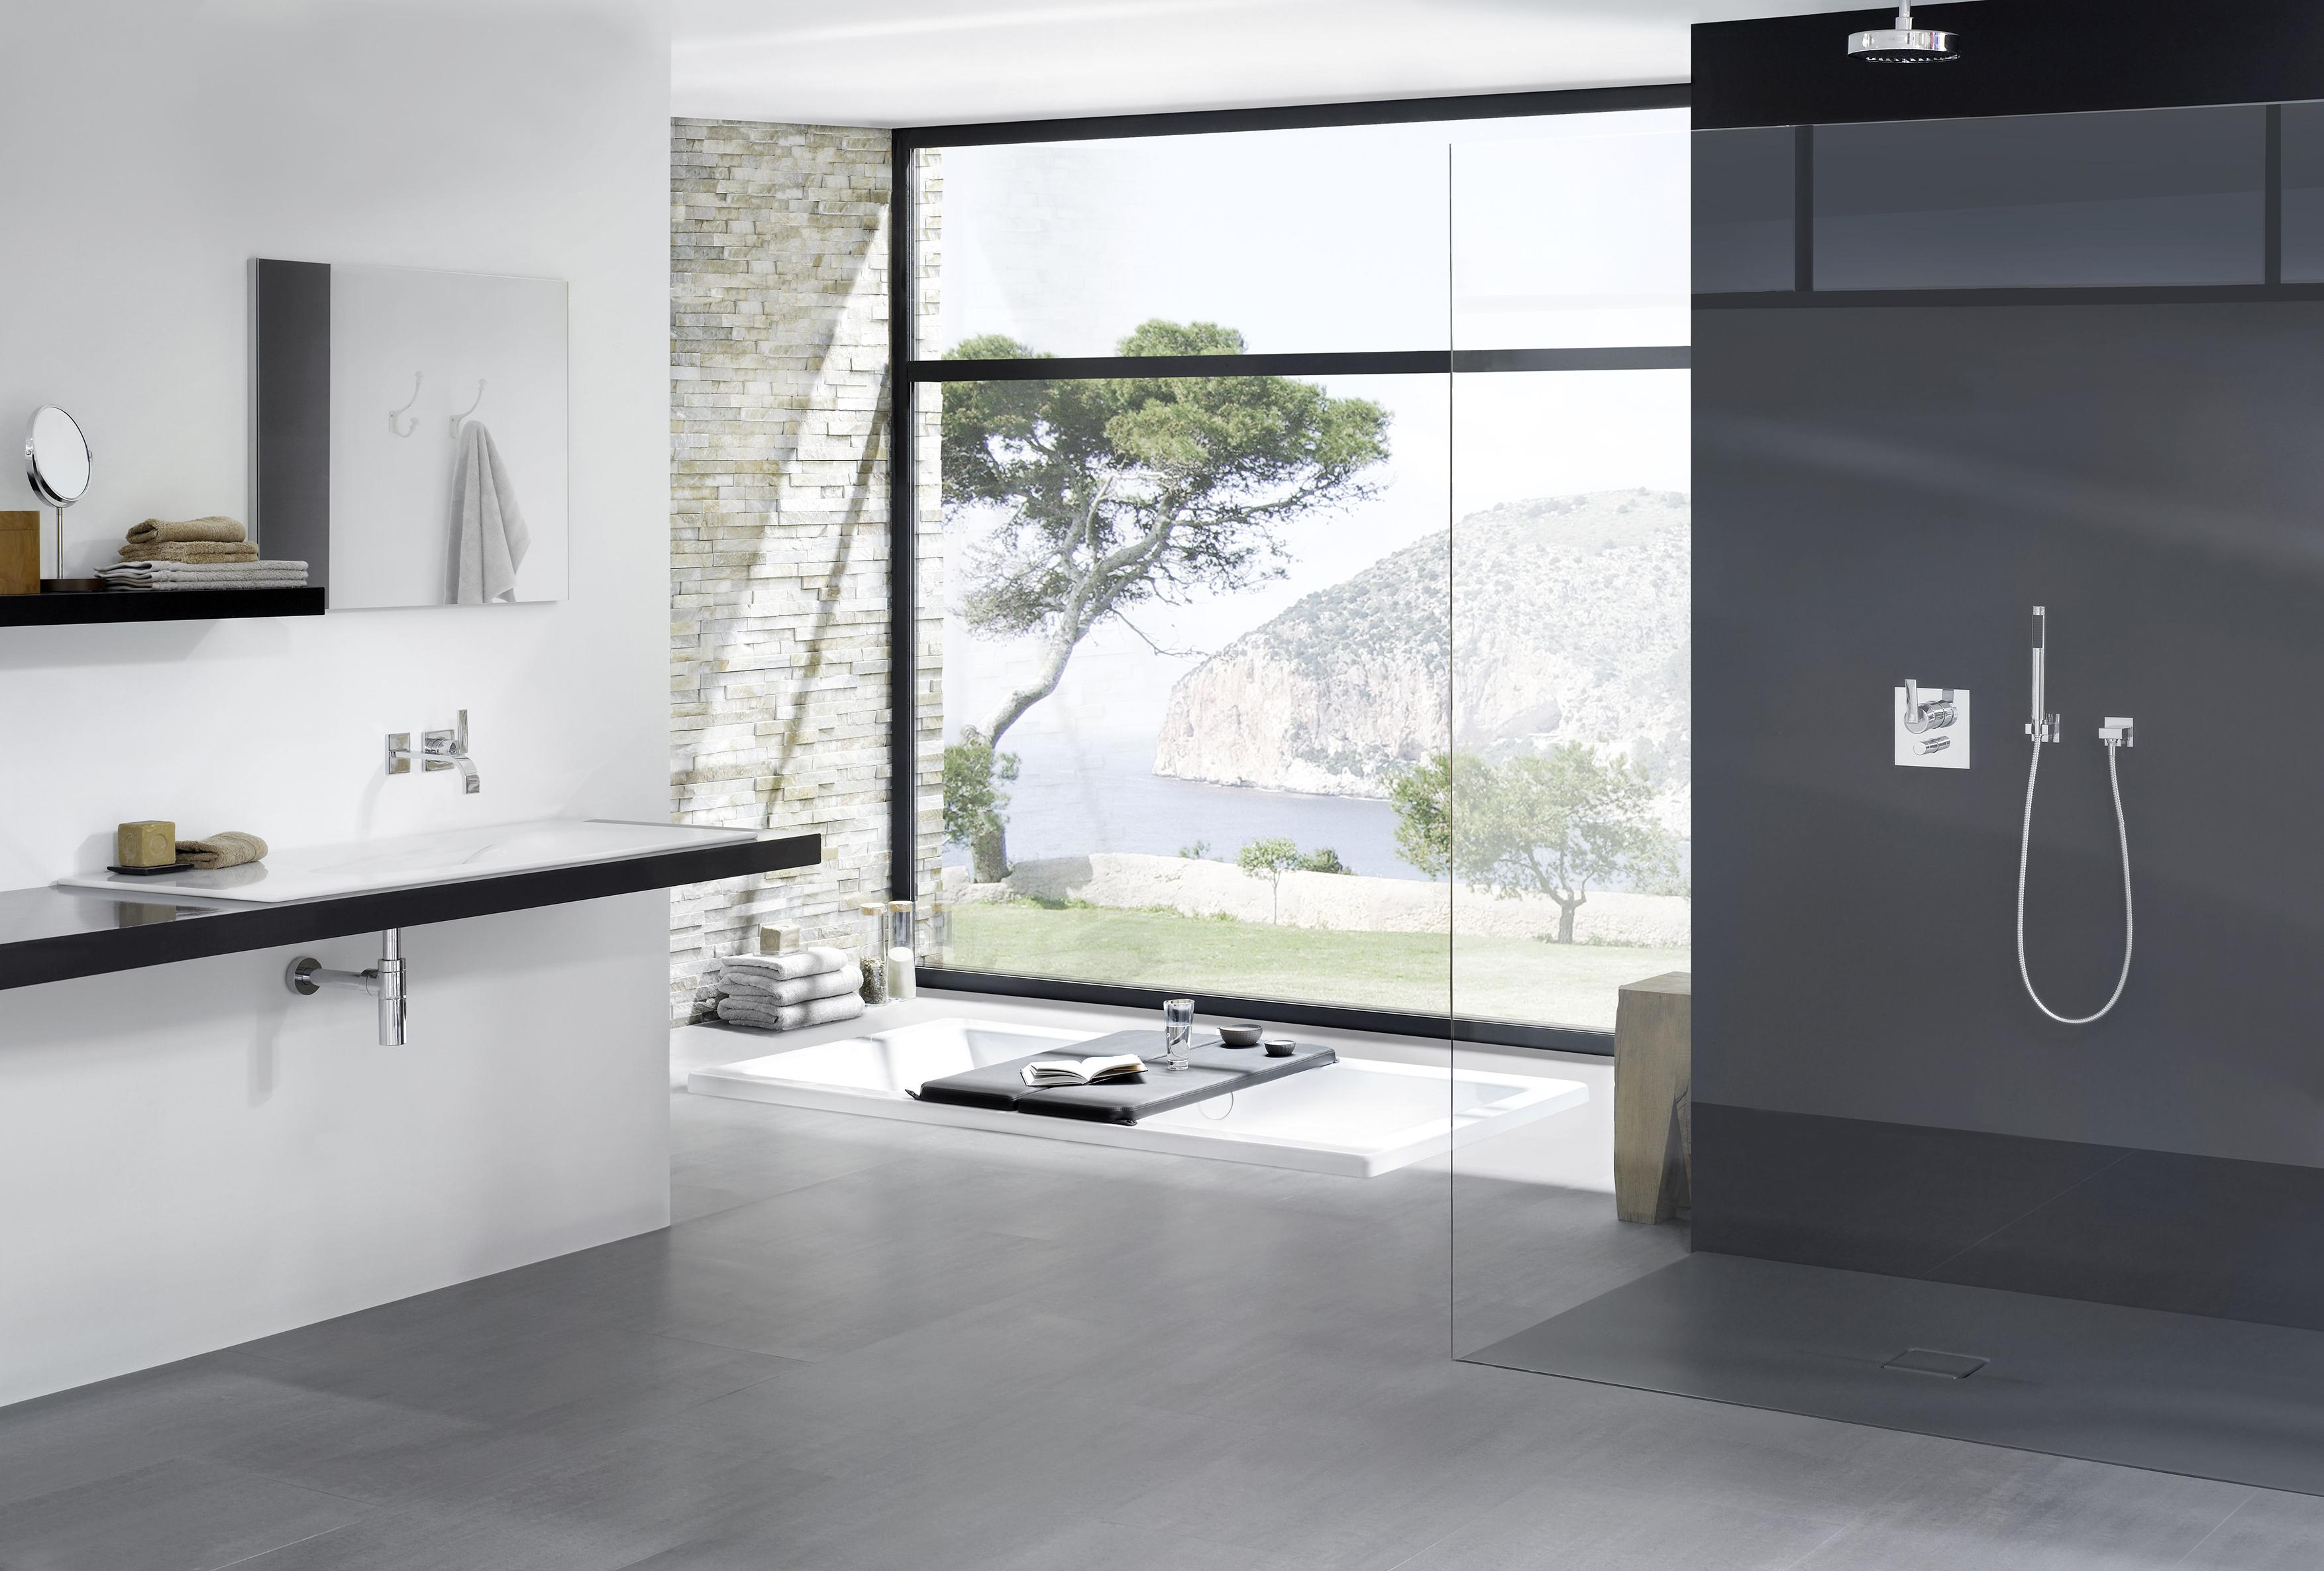 kaldewei entspannung mal anders die badewanne wird zur. Black Bedroom Furniture Sets. Home Design Ideas